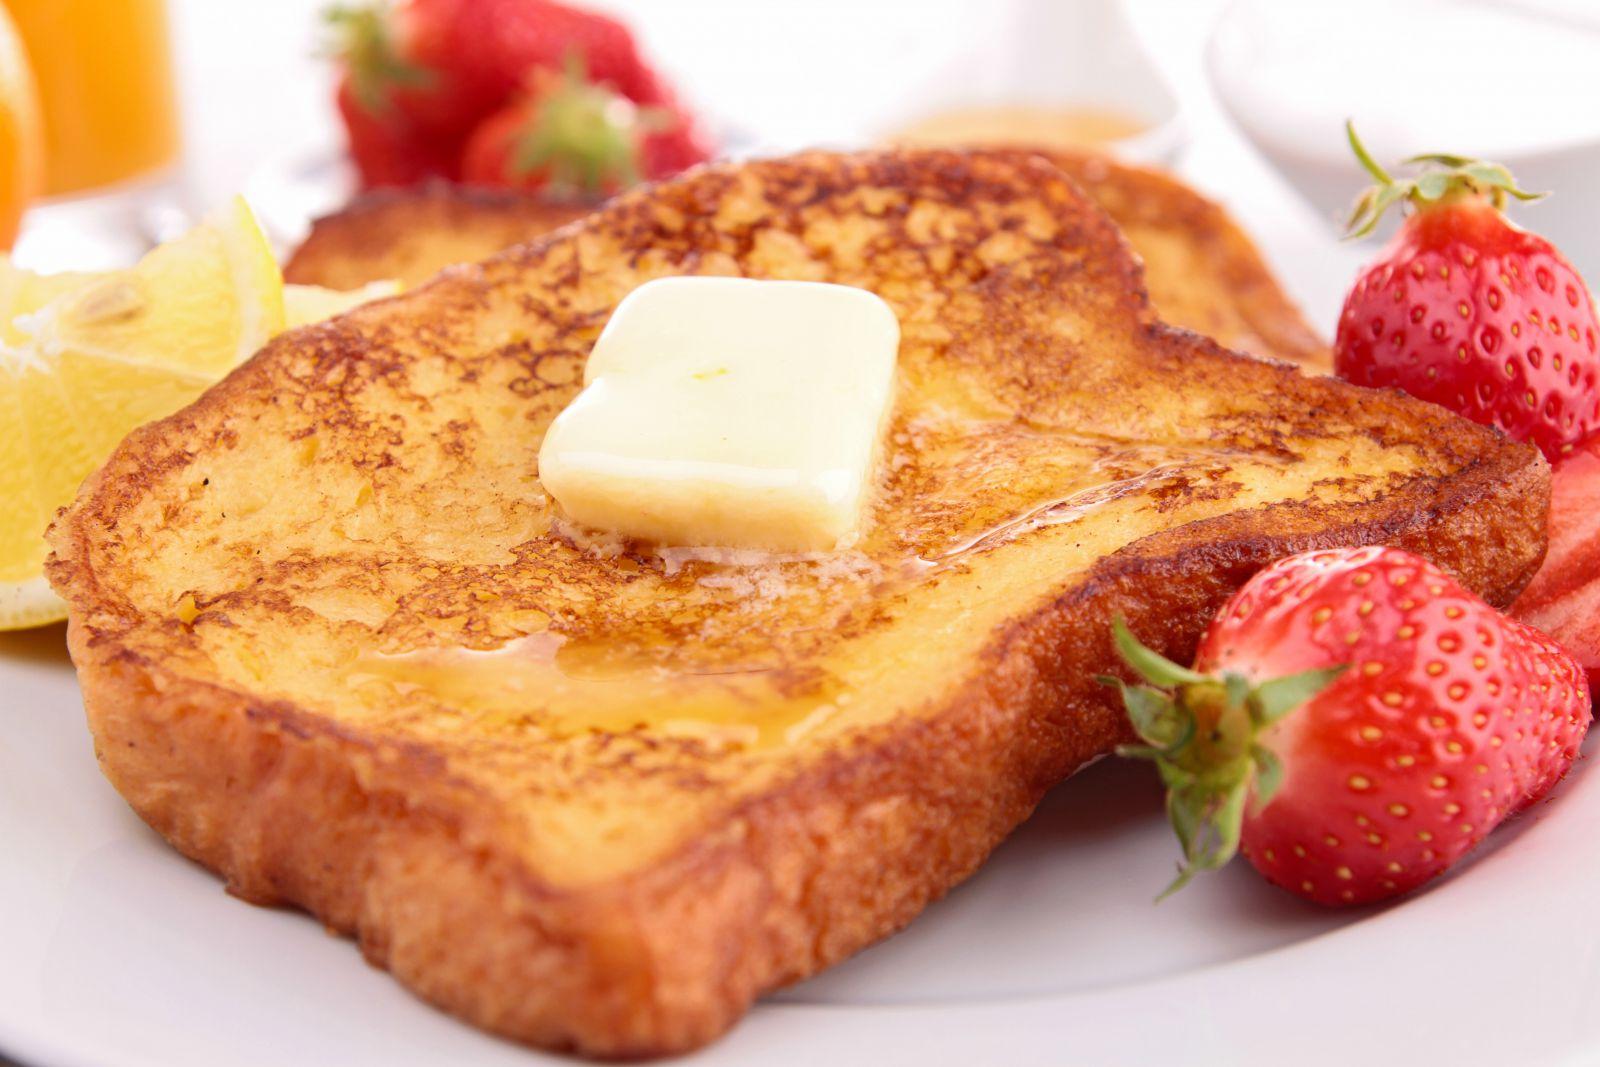 Strawberry Cream Cheese French Toast